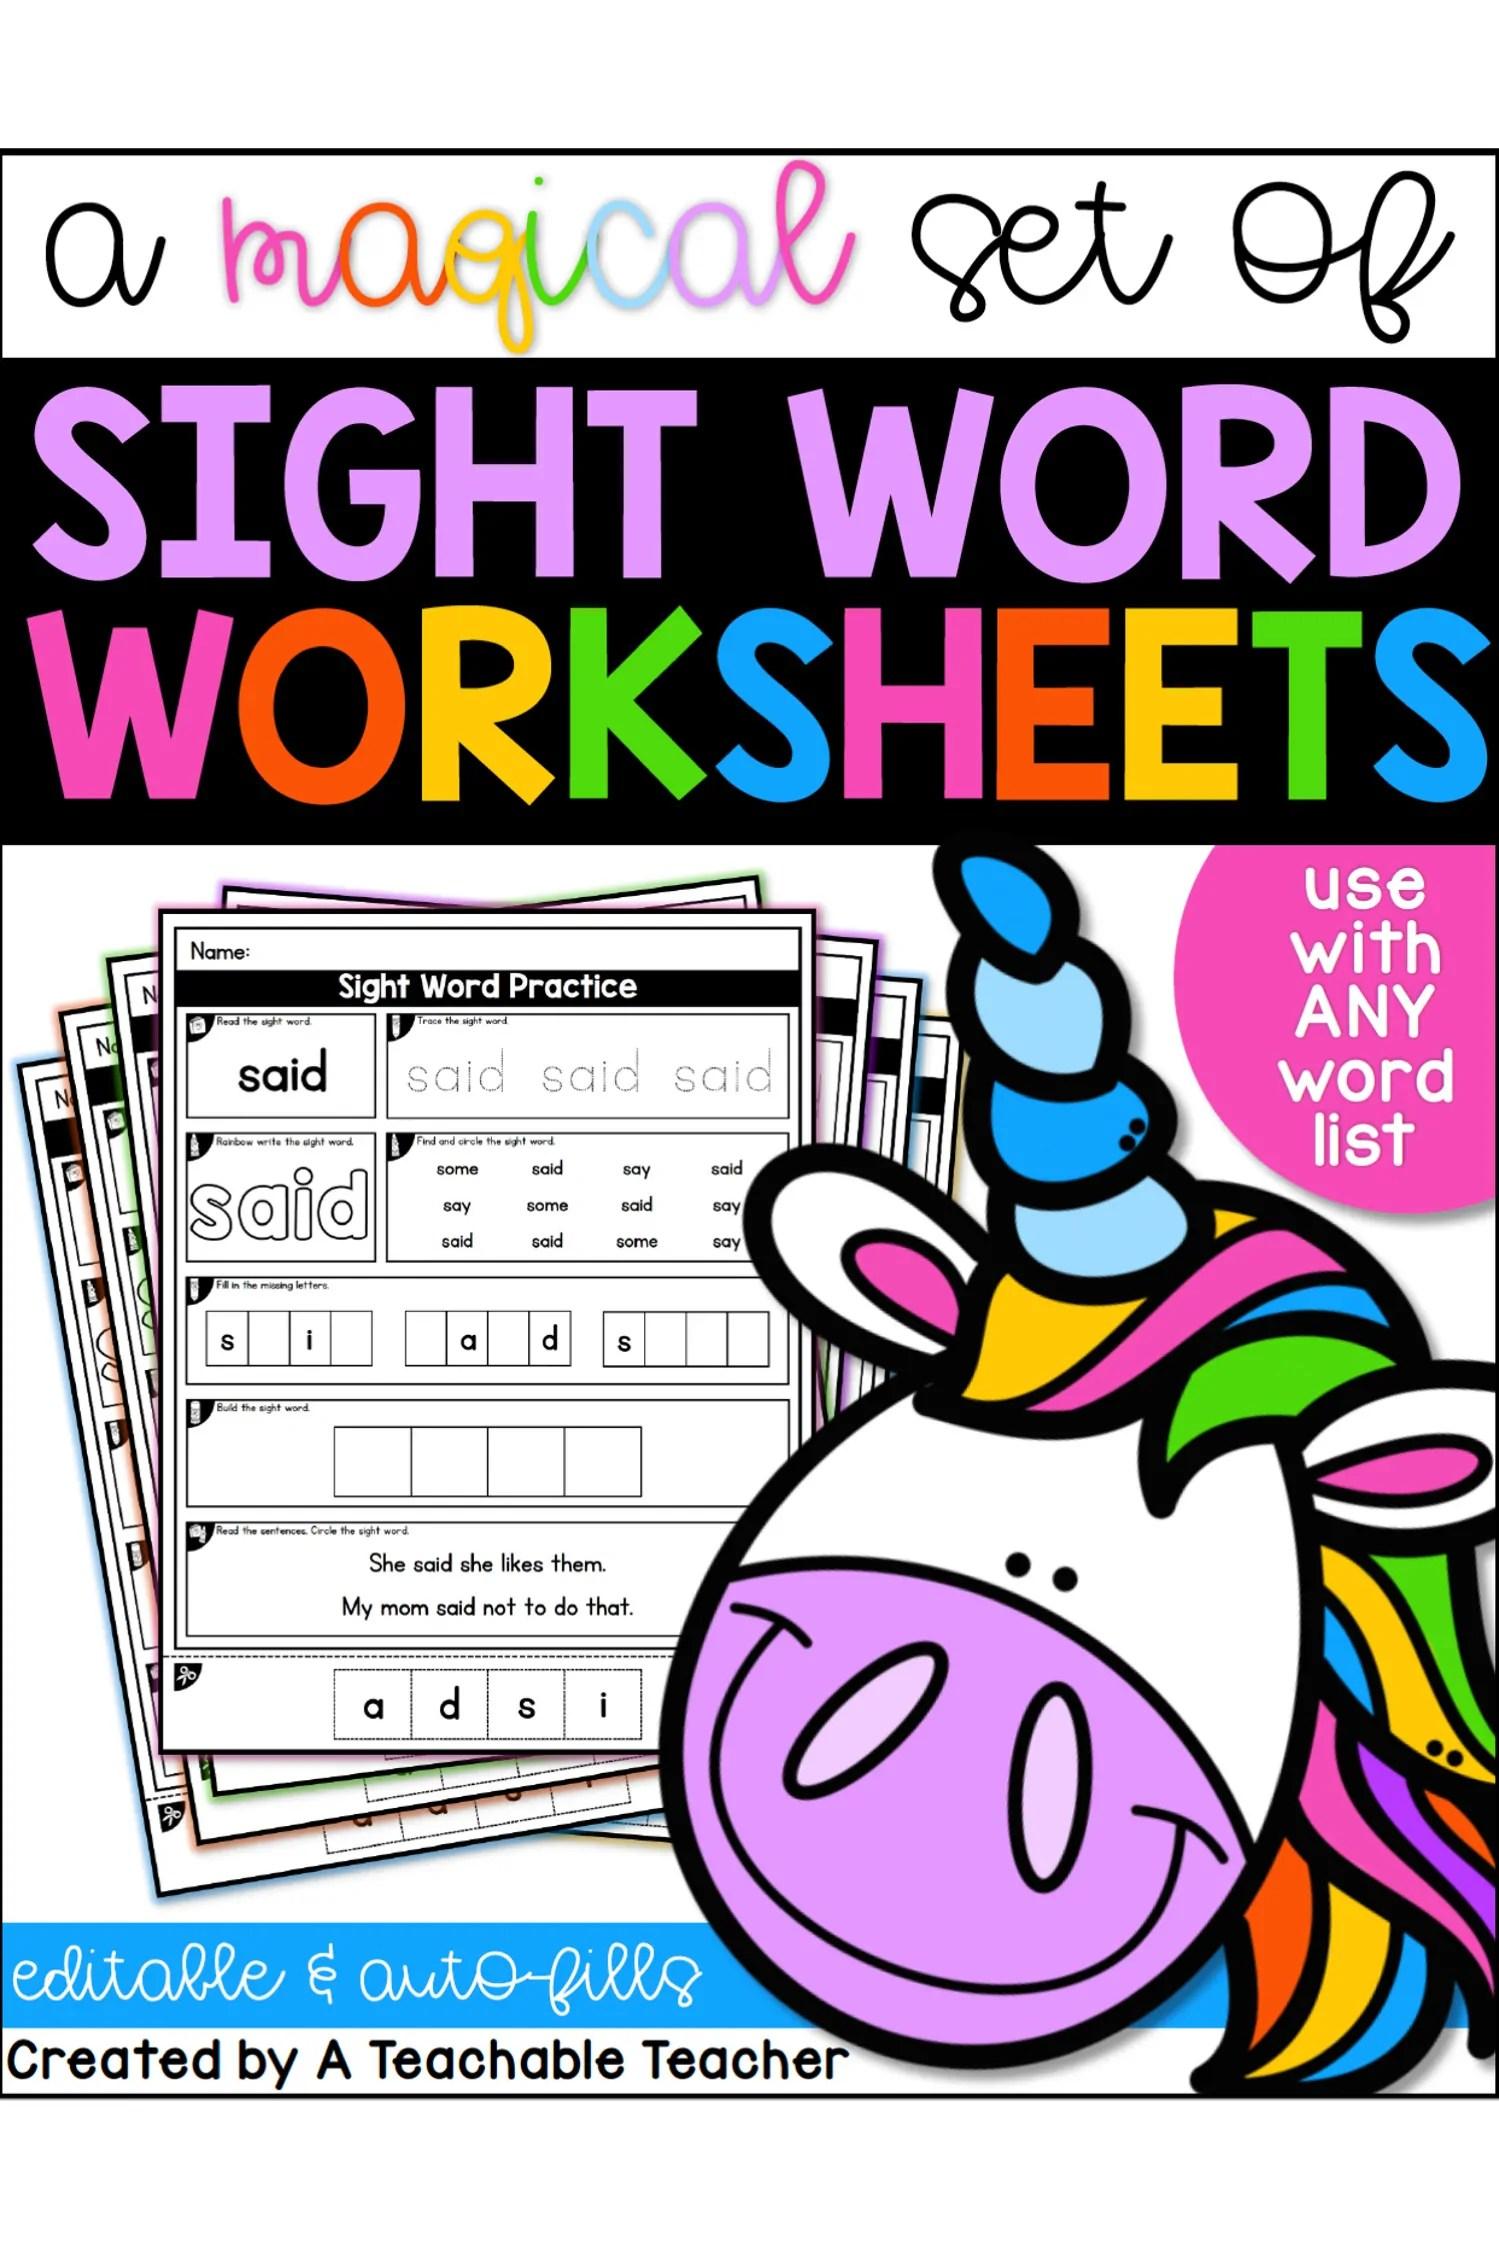 hight resolution of Editable Sight Word Worksheets - A Teachable Teacher